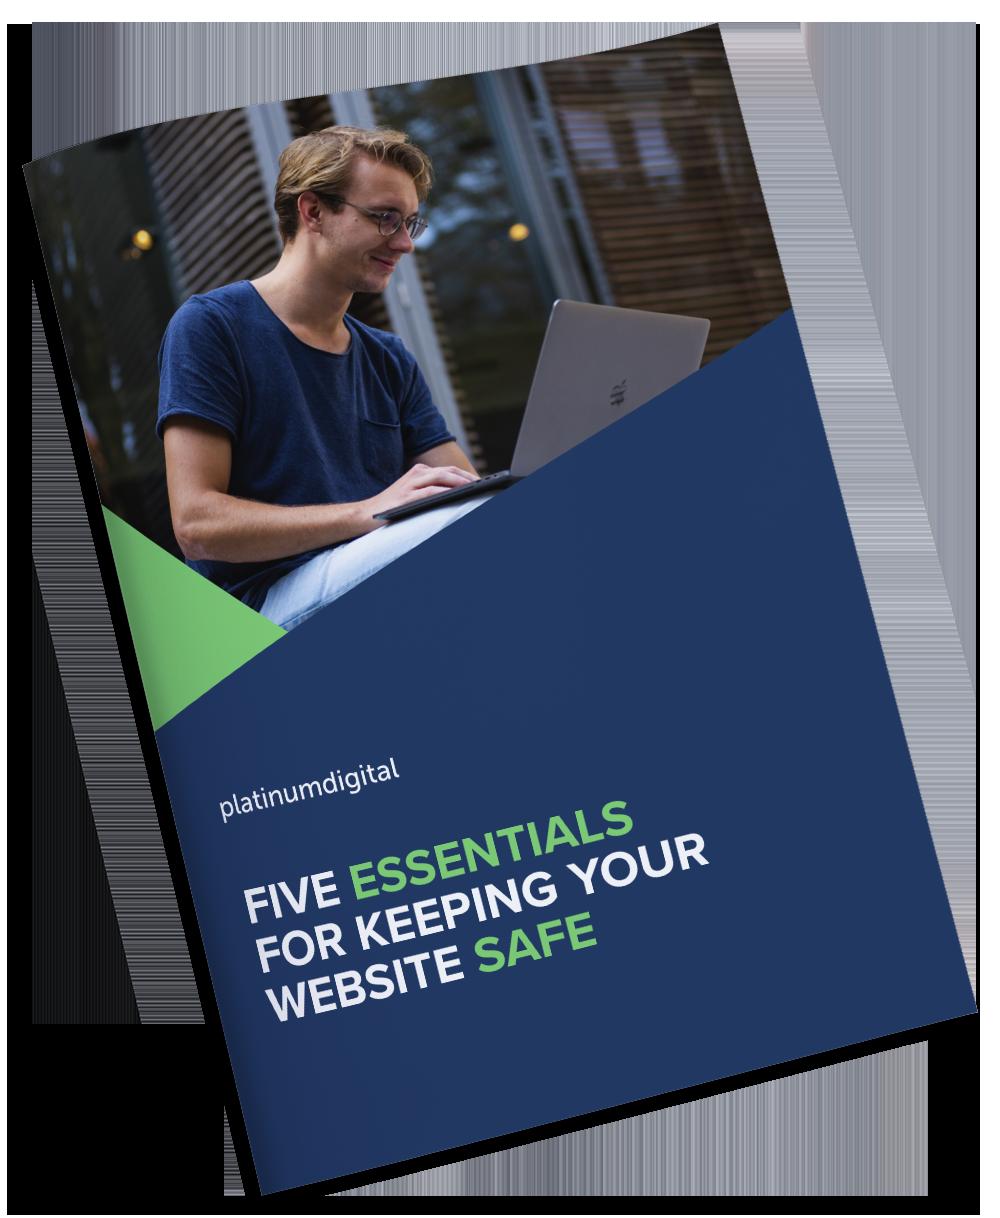 Platinum Digital - Five Essentials For Keeping Your WordPress Website Safe eBook